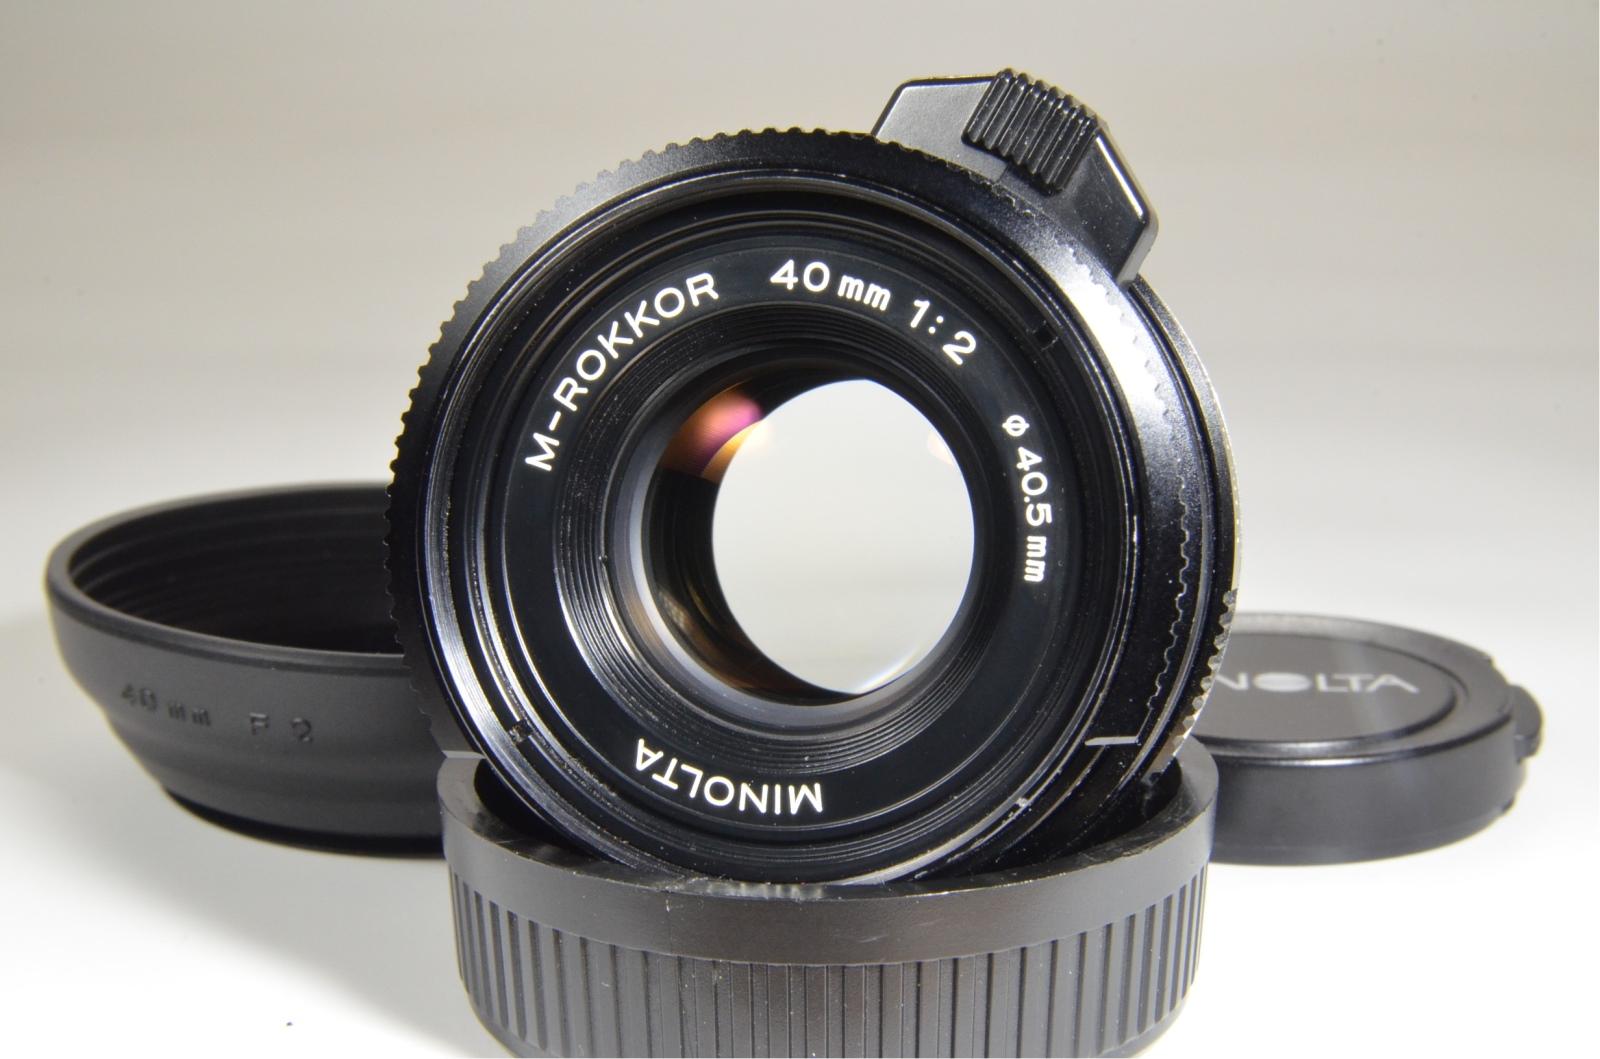 minolta cle 35mm film camera with m-rokkor 40mm f2, 28mm f2.8, 90mm f4 and flash